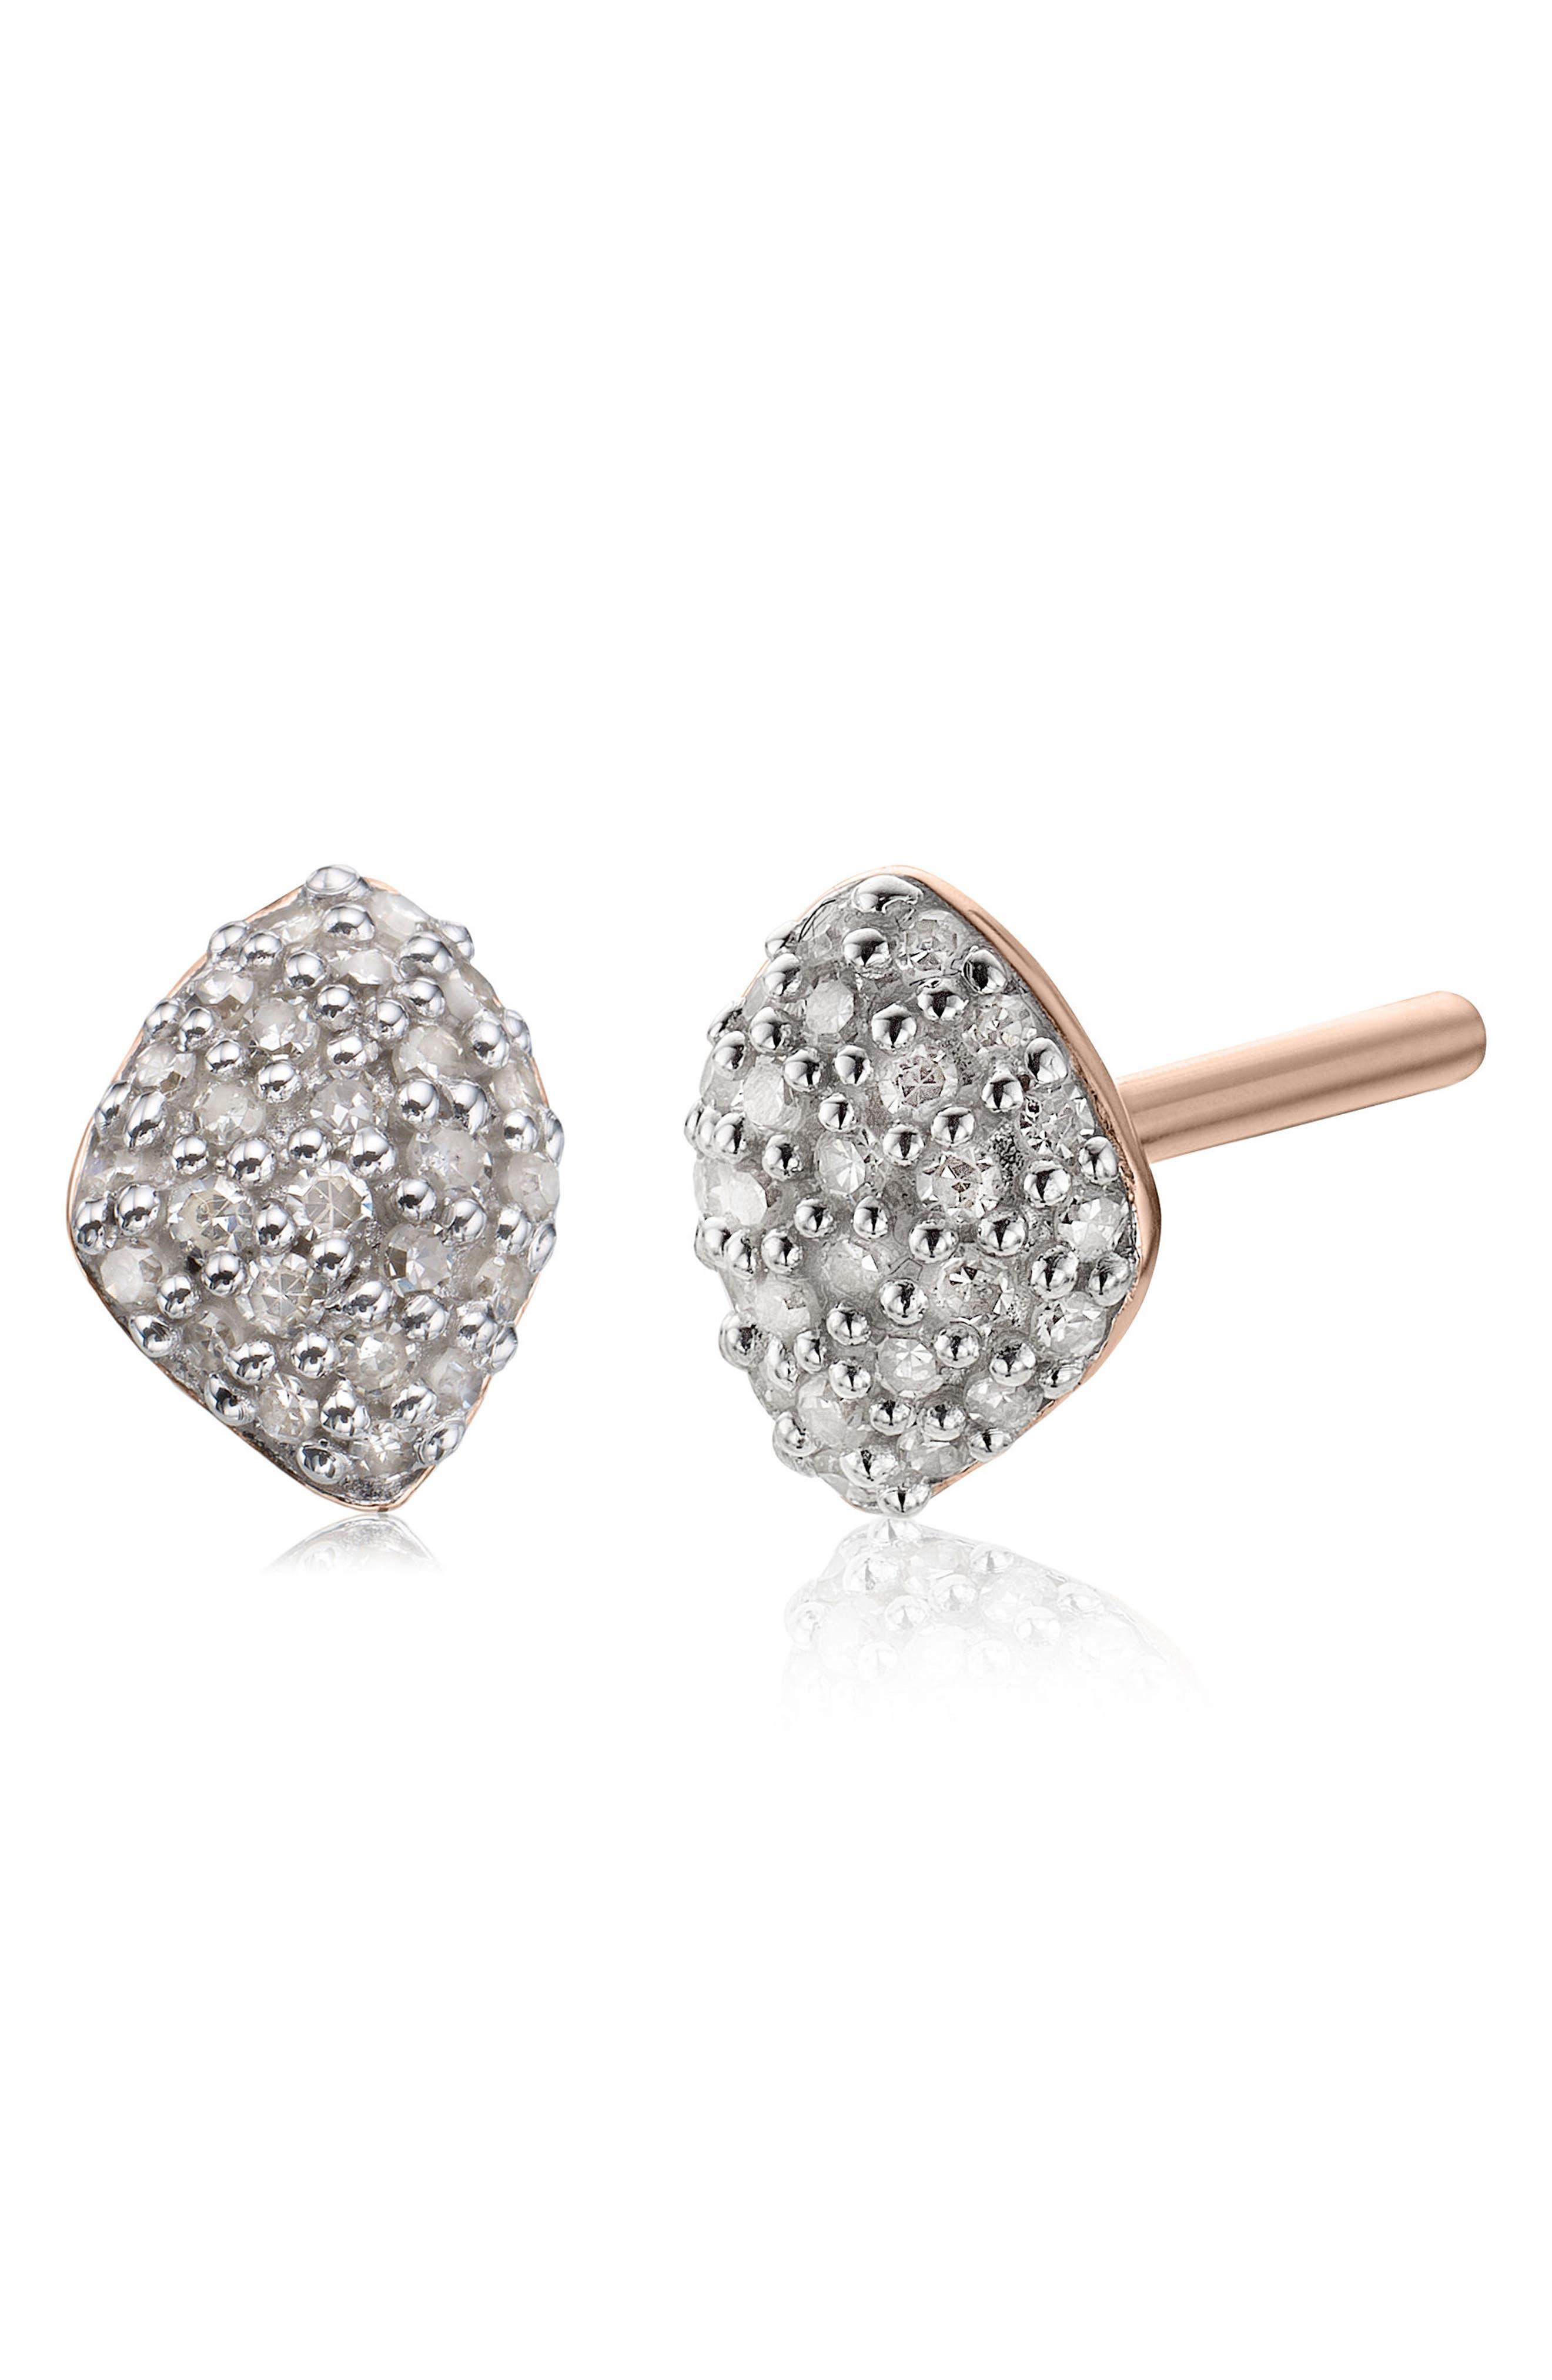 MONICA VINADER, Nura Mini Diamond Stud Earrings, Alternate thumbnail 3, color, ROSE GOLD/ DIAMOND